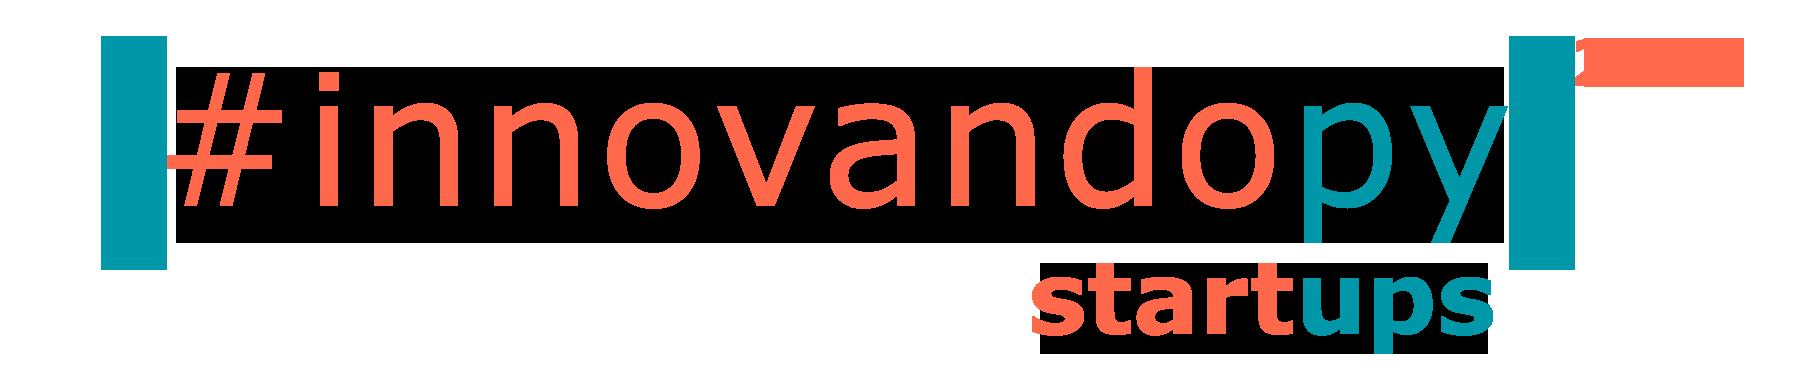 InnovandoPY Startups 2017